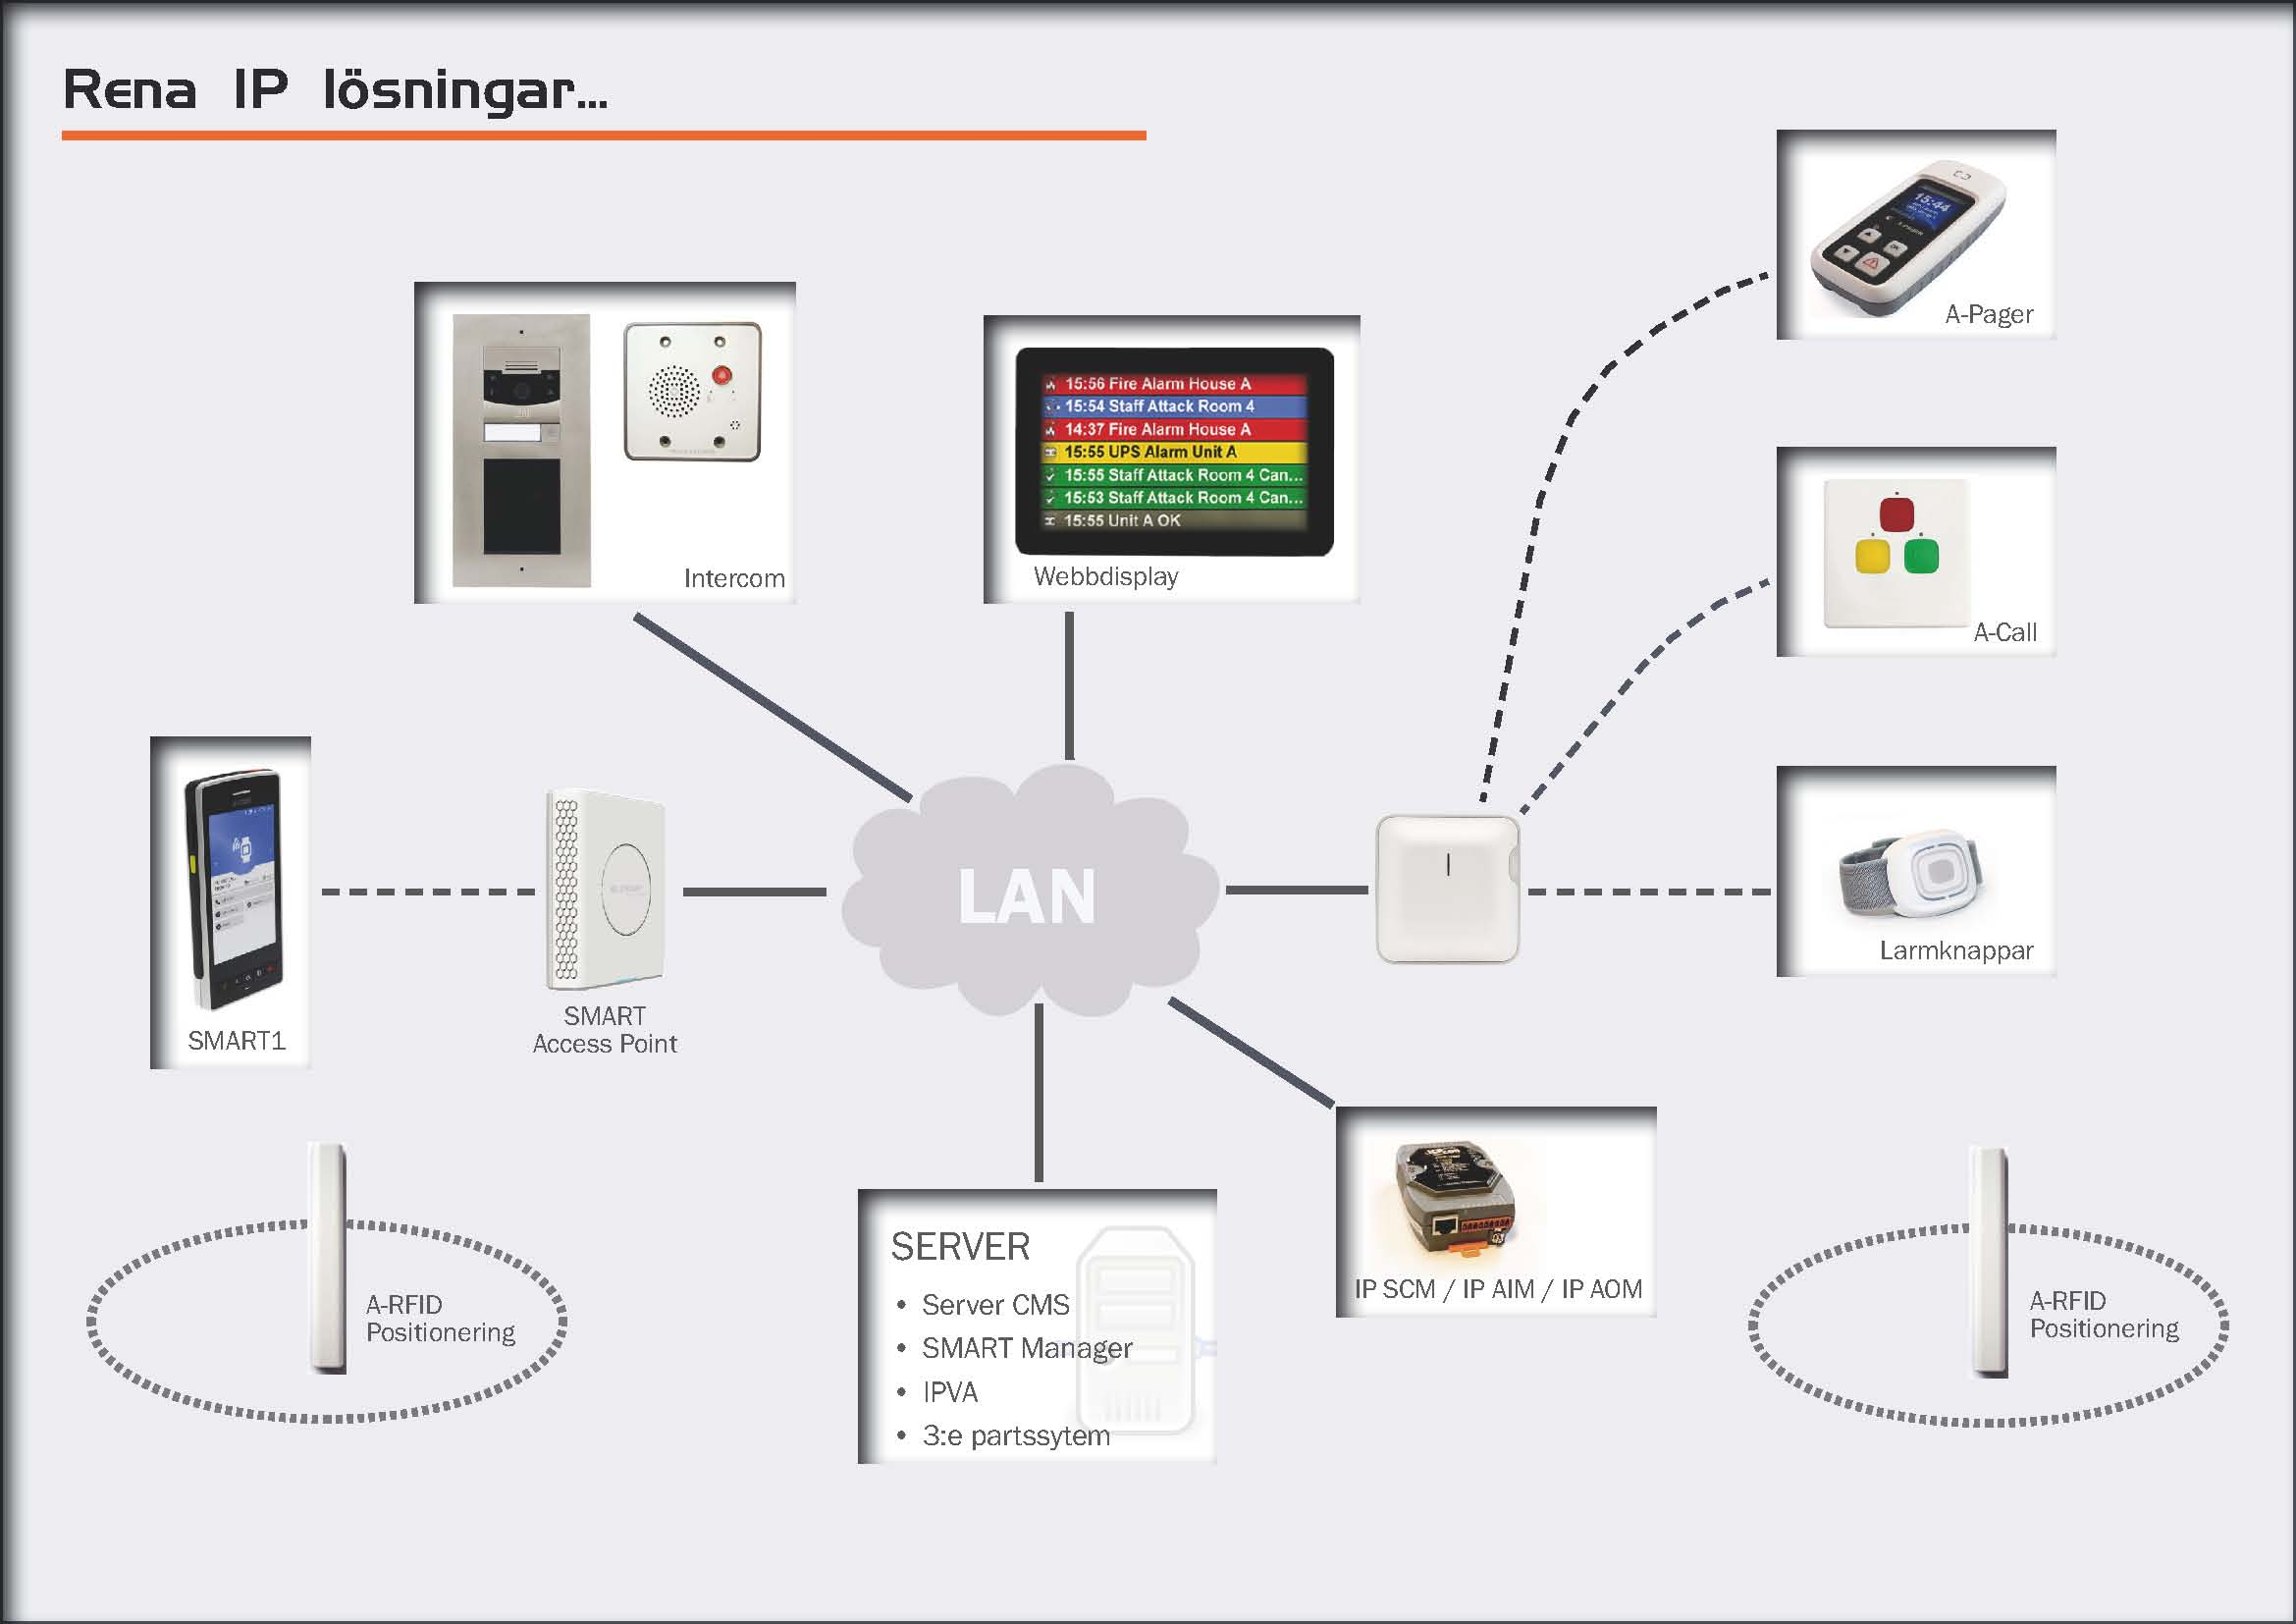 Rena IP lösningar - SMART1